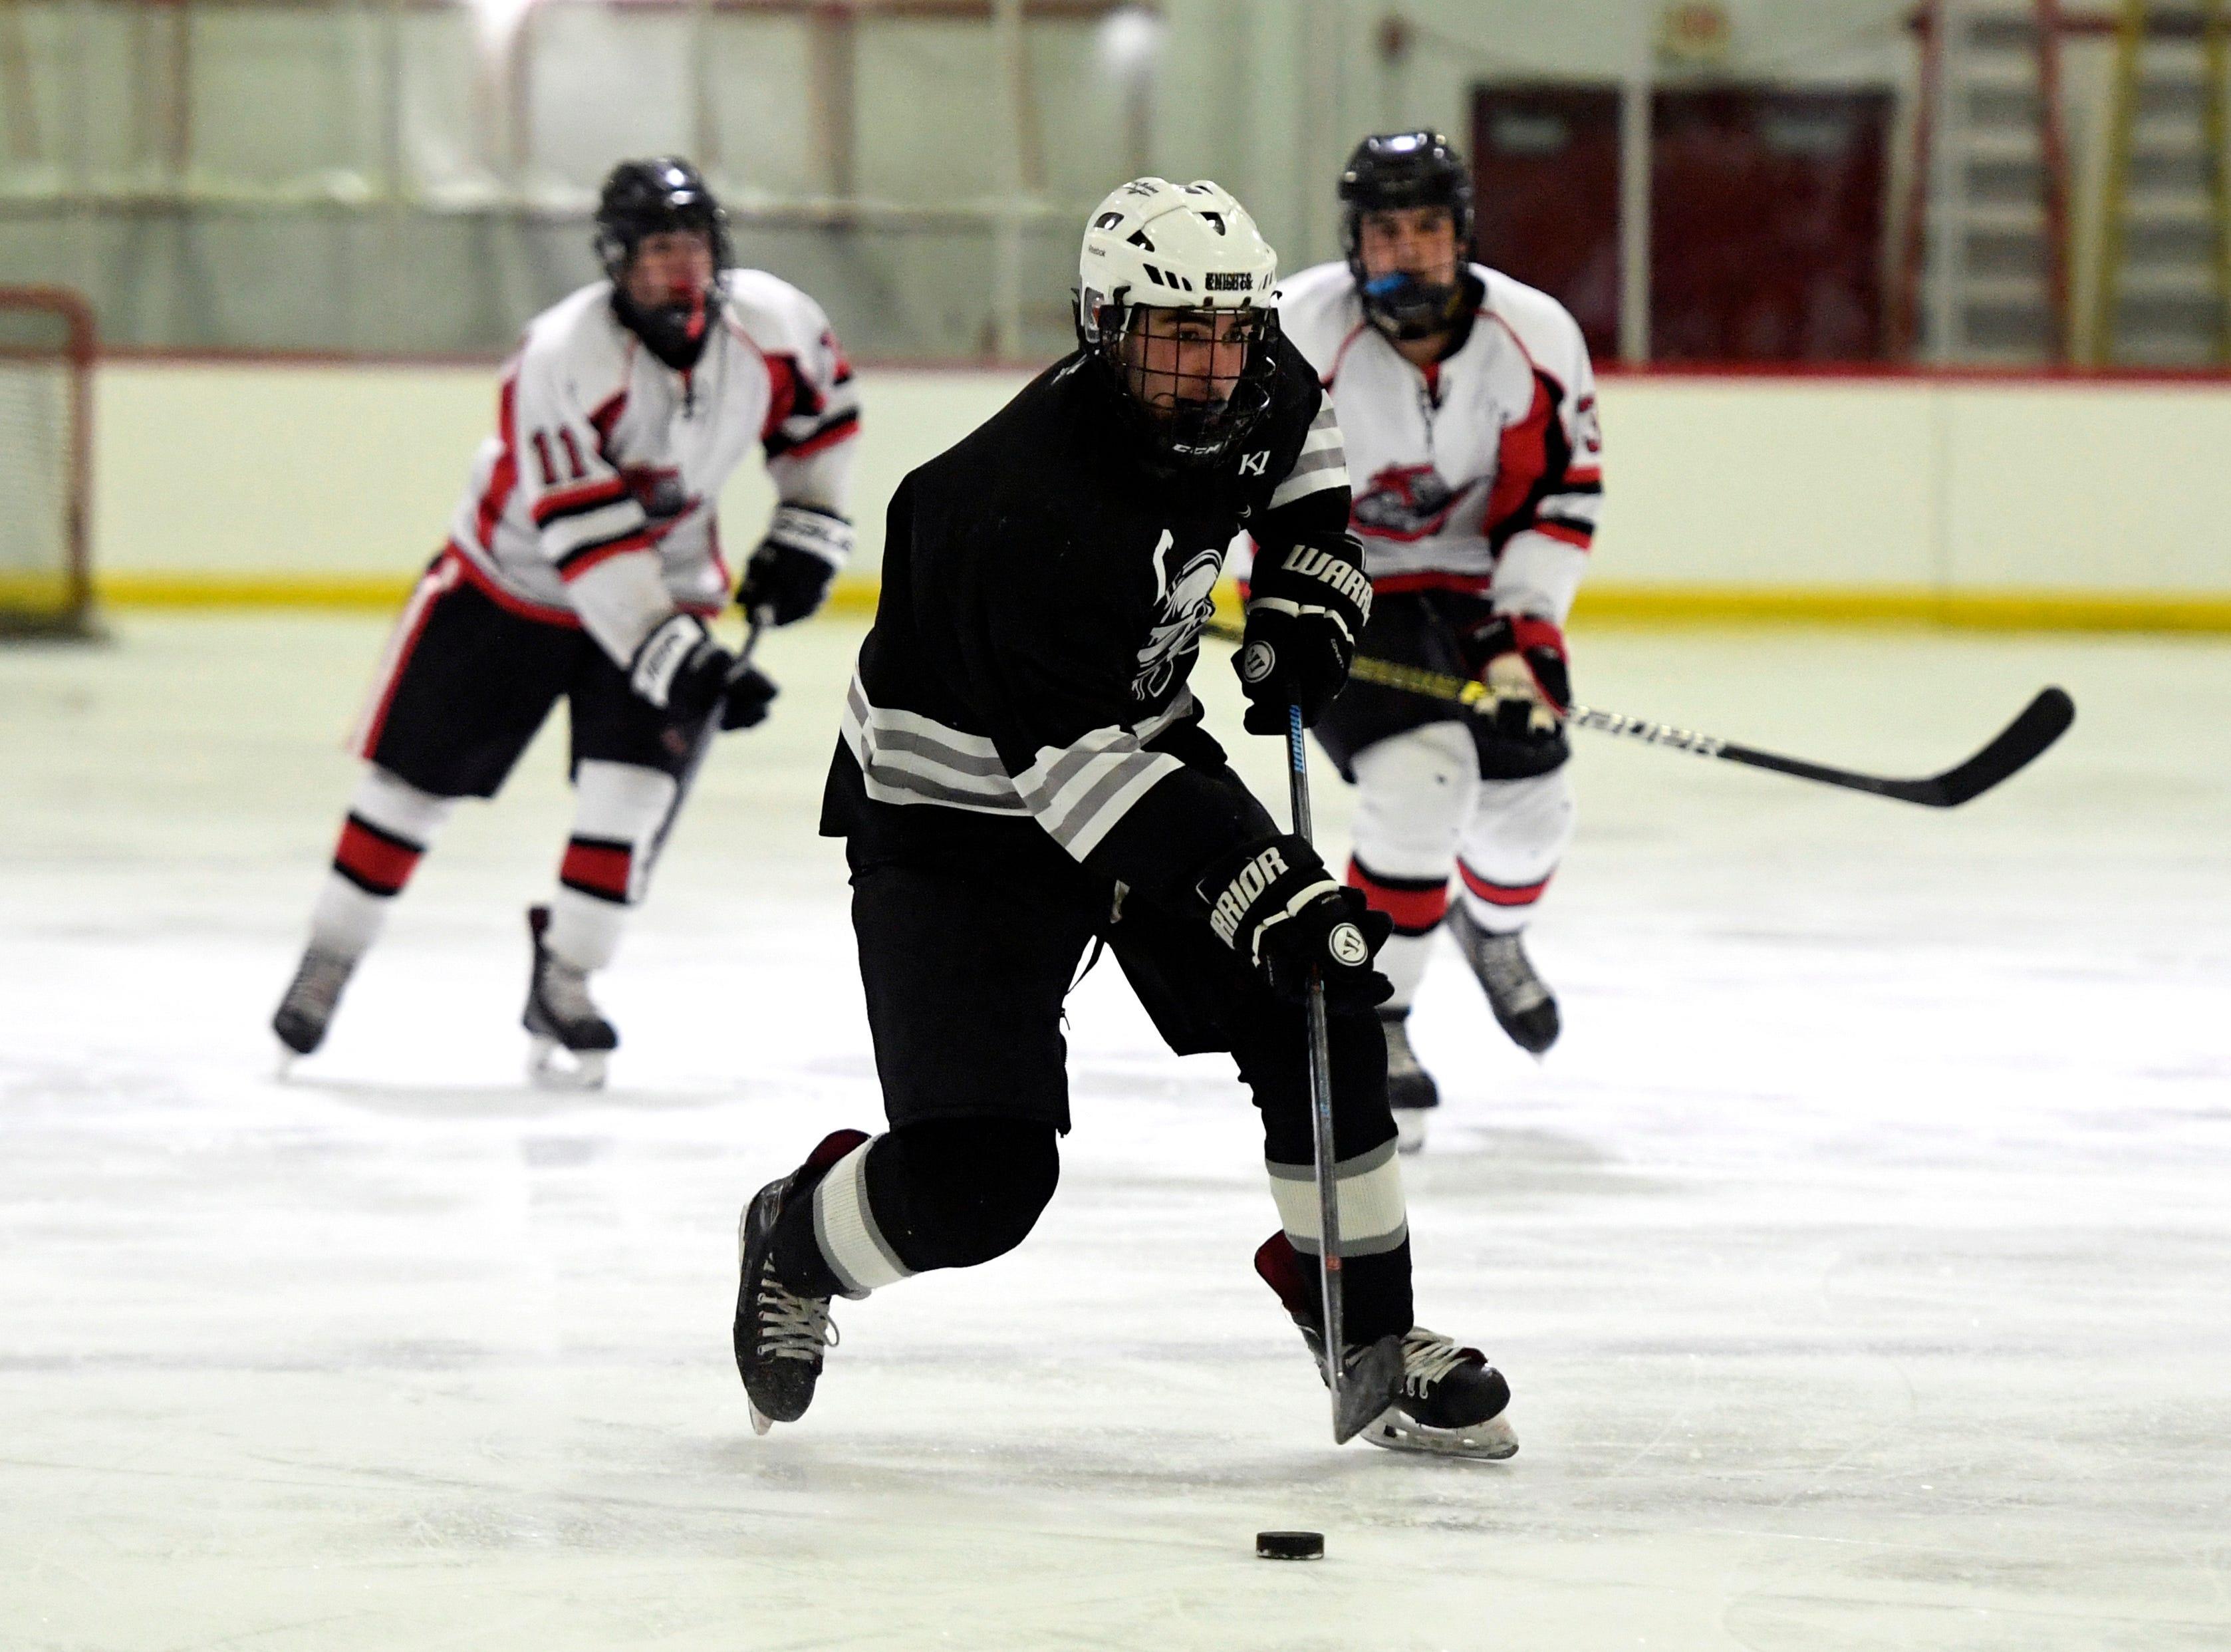 Wayne's Jared Cohen skates against Lakeland. Lakeland defeats Wayne in the Passaic County hockey championship, 6-3, on Monday, Jan. 28, 2019 in Little Falls.